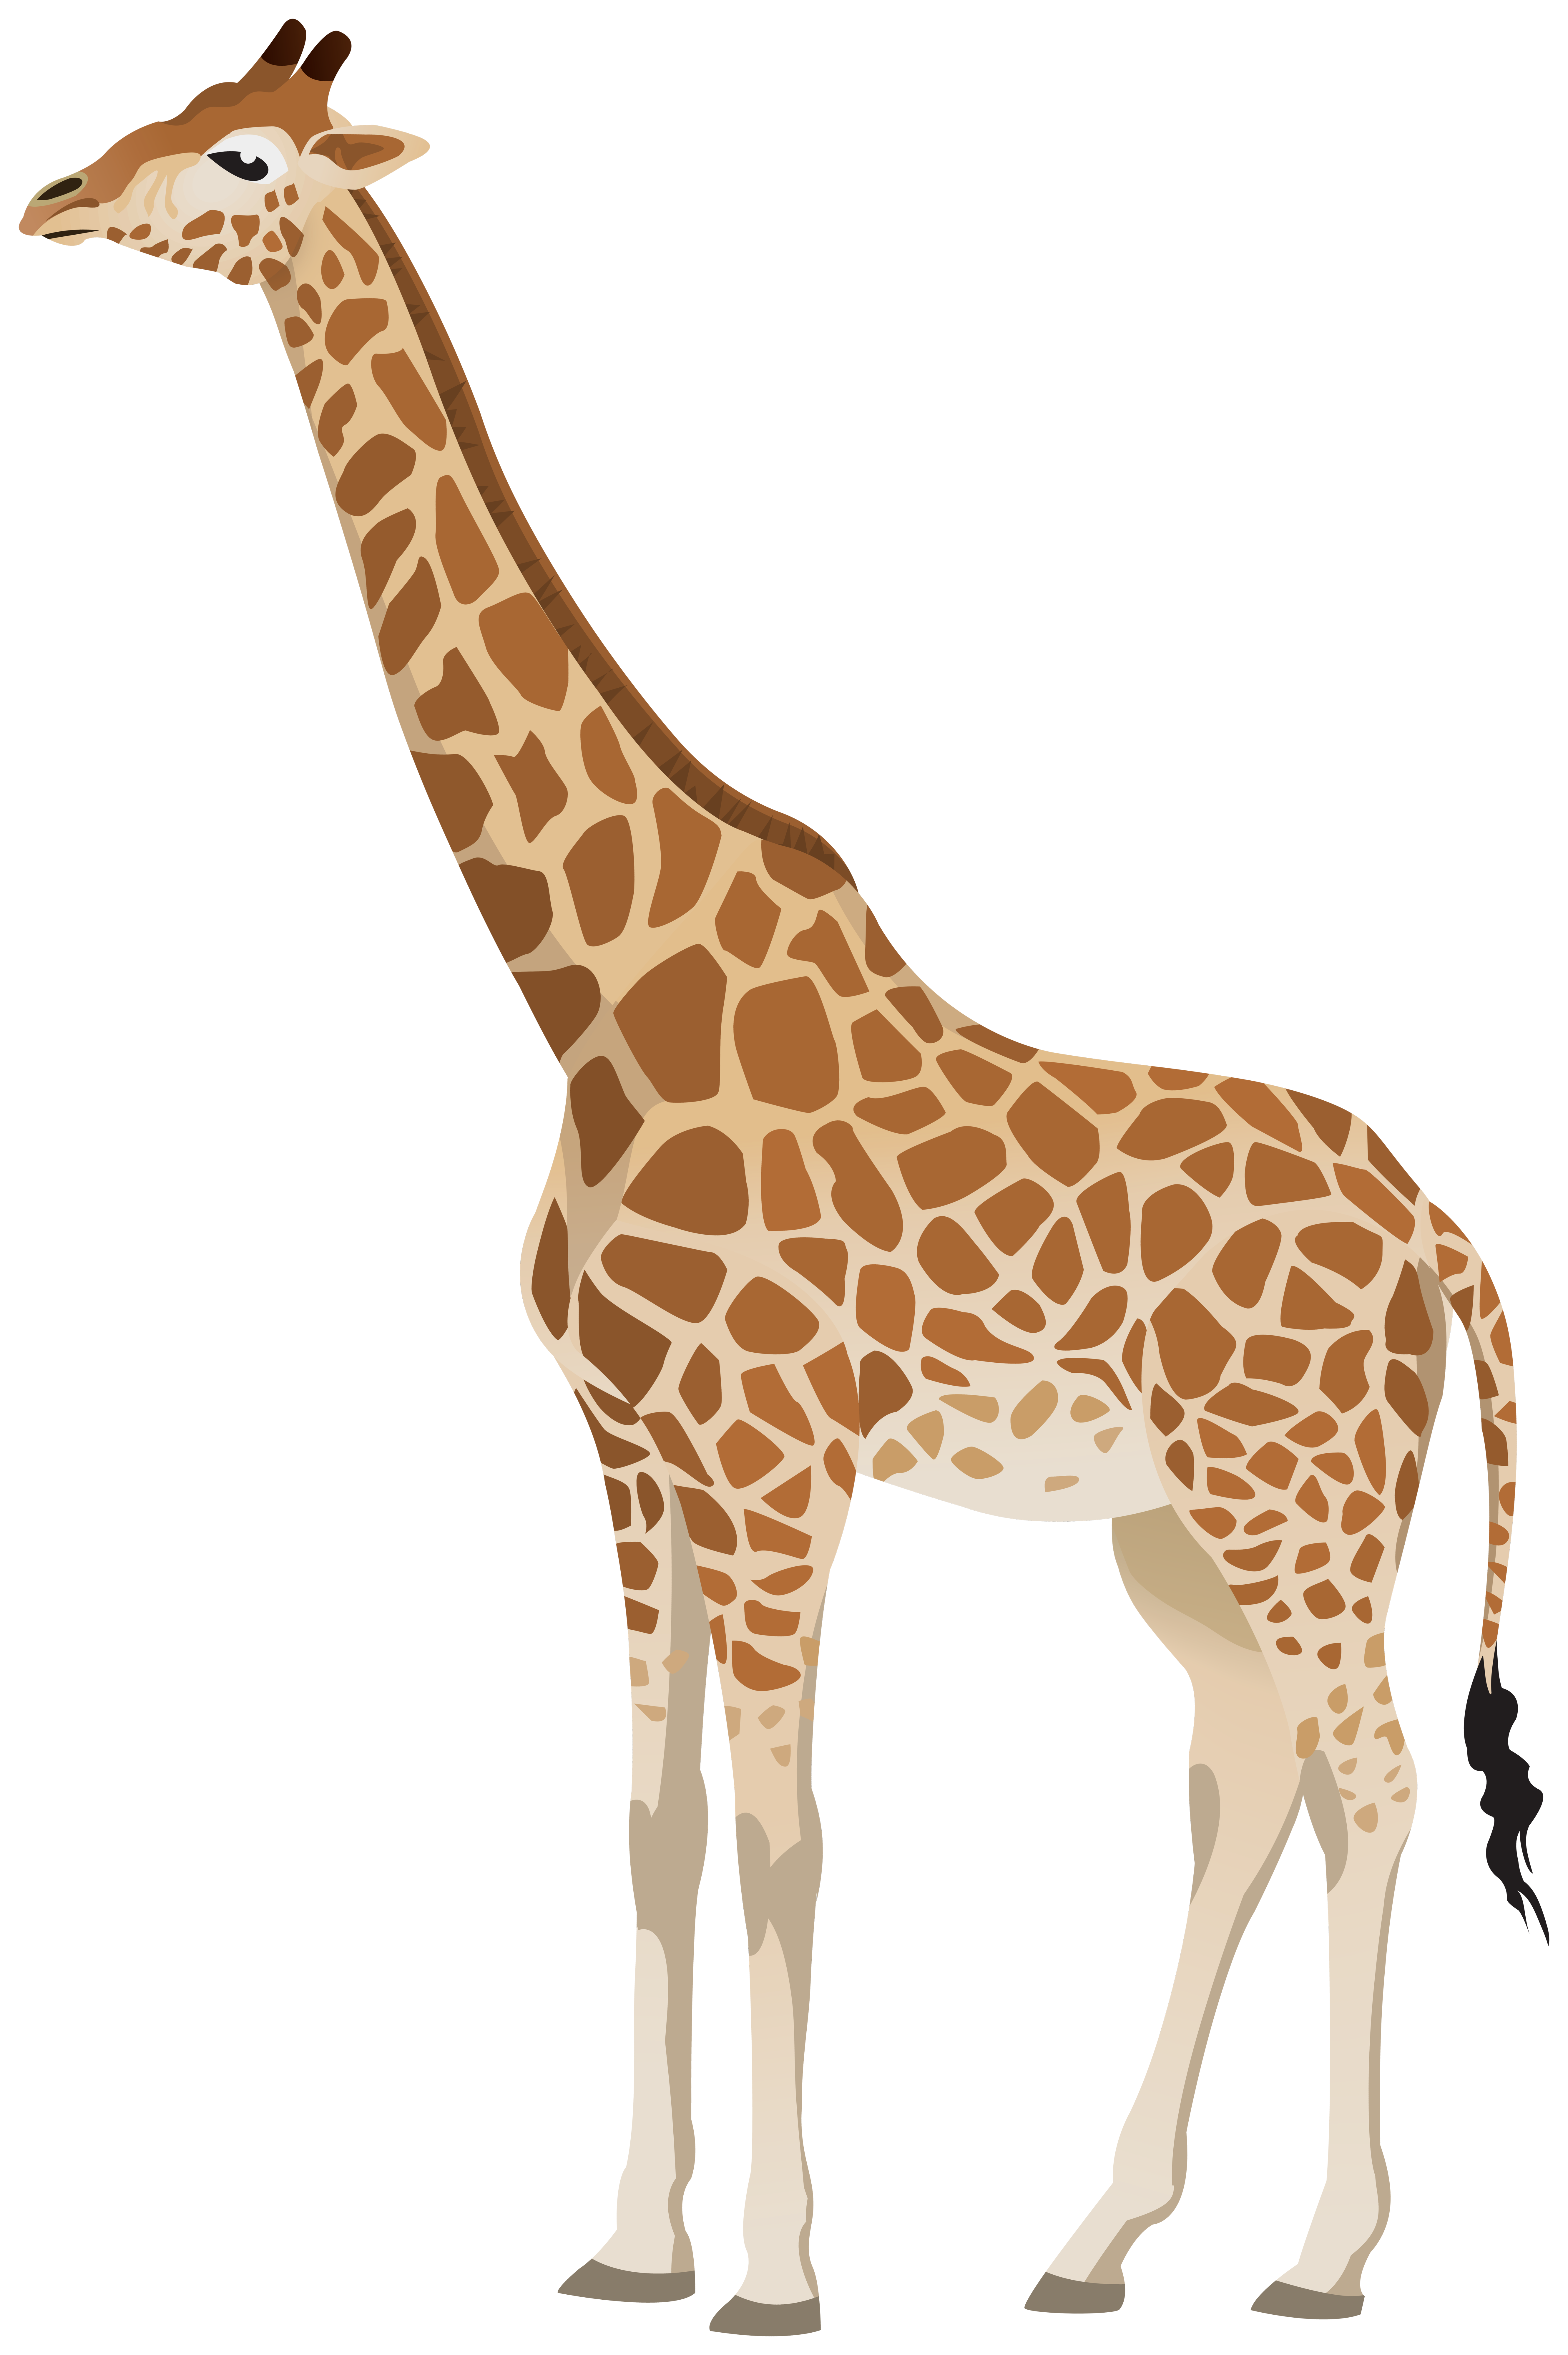 Giraffe Clipart Image.